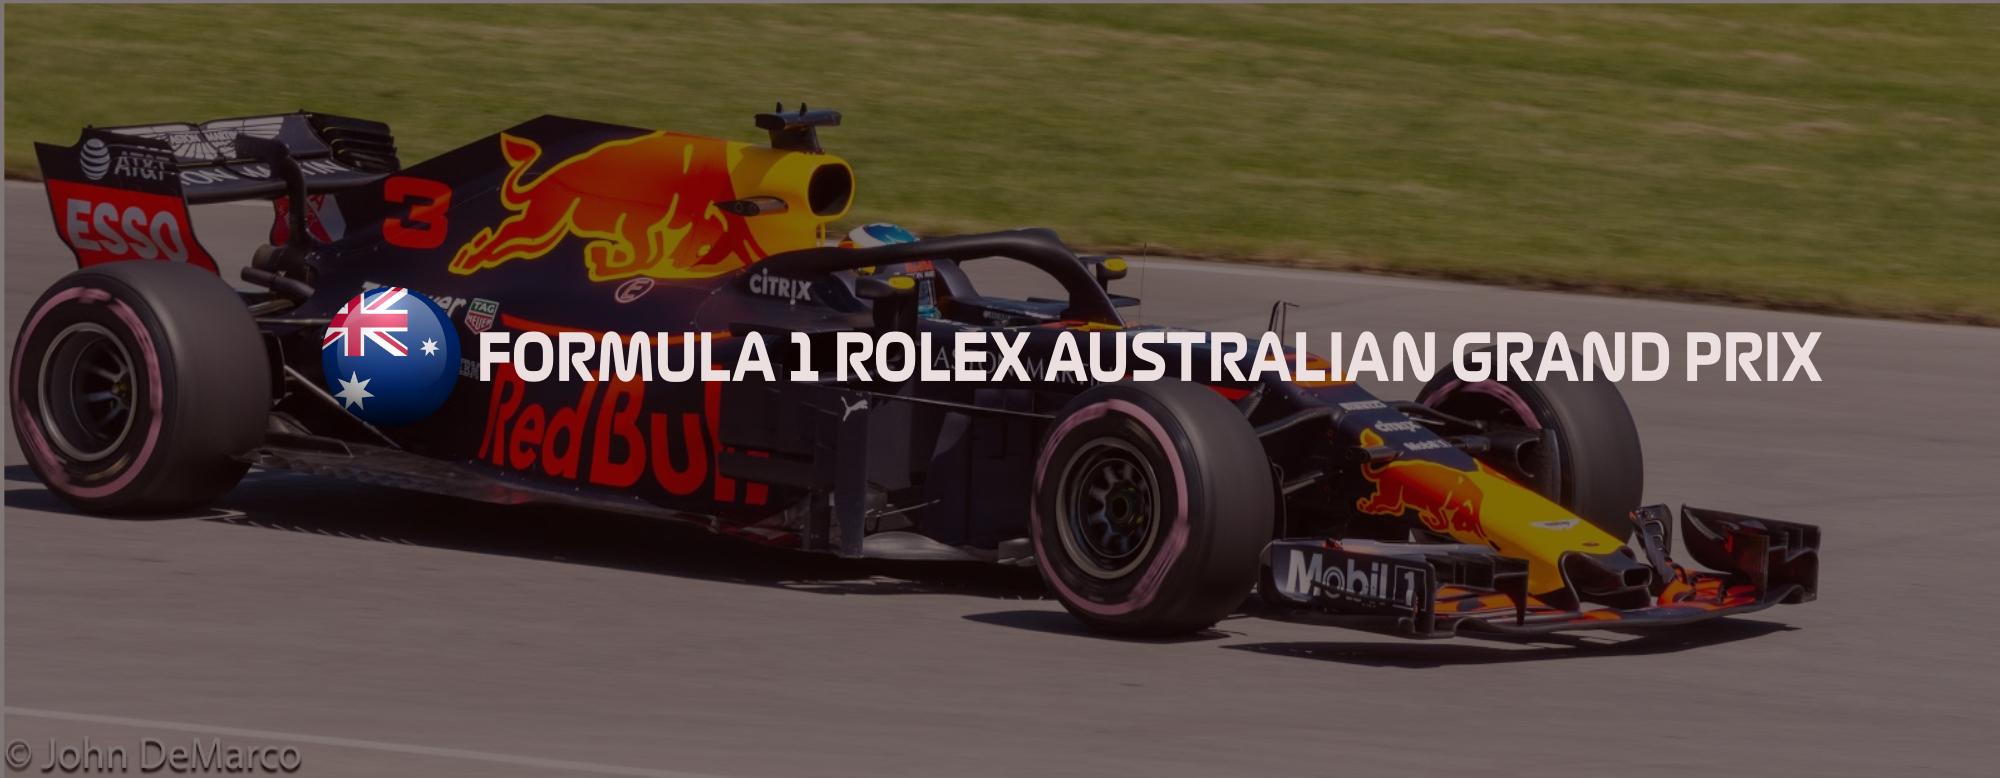 F1 Travel Experiences